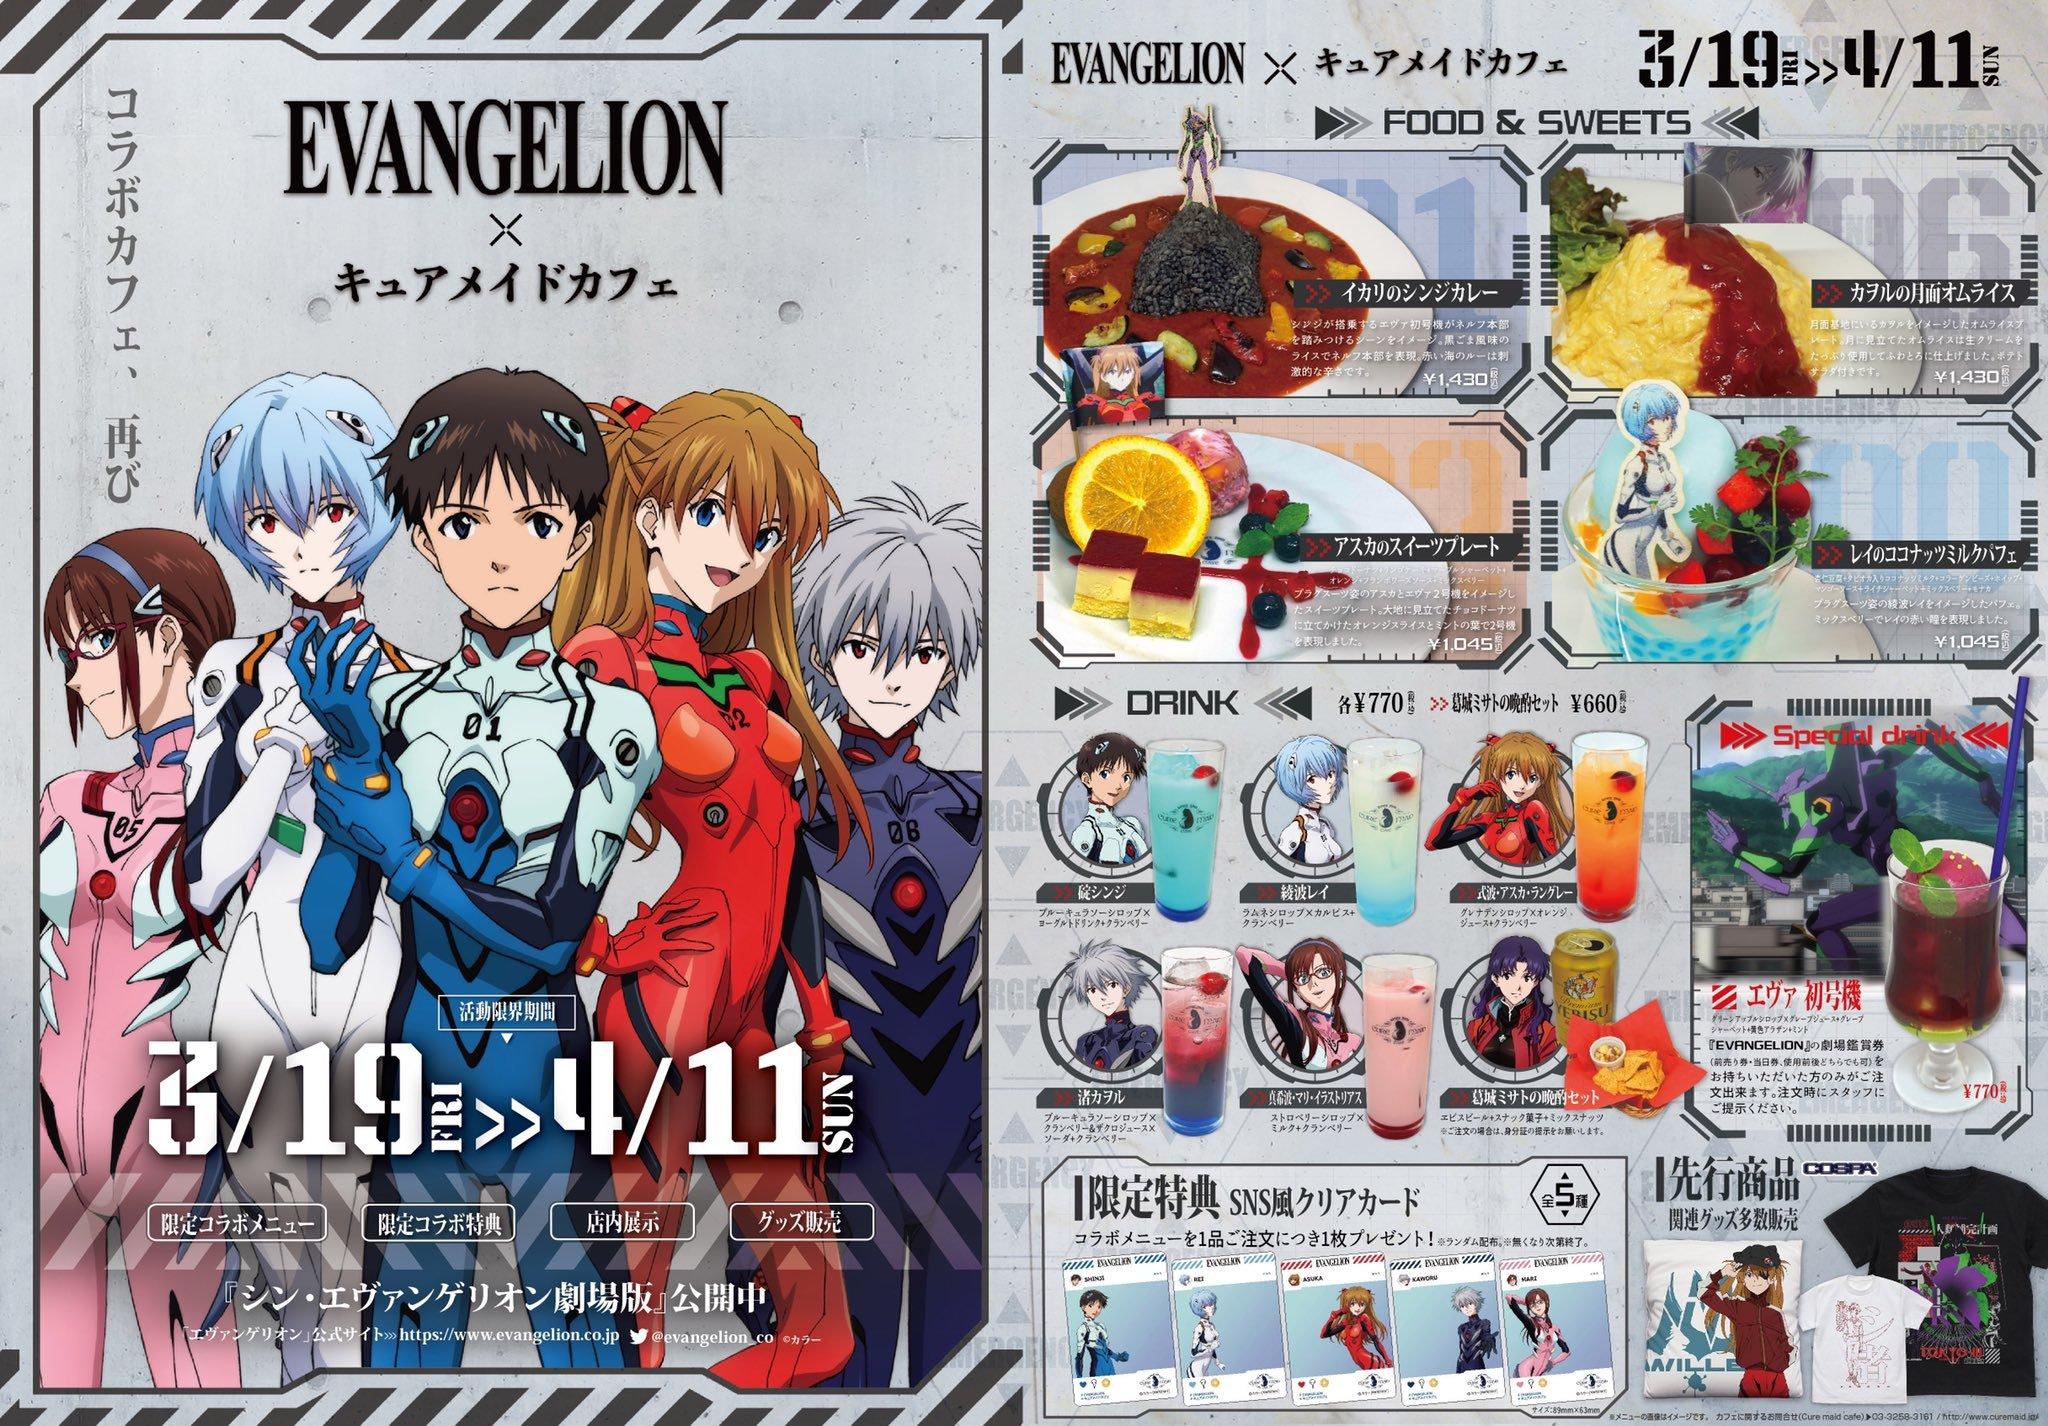 Evangelion Cure Maid Café 新世纪福音战士新剧场版:终_20210318152146_05